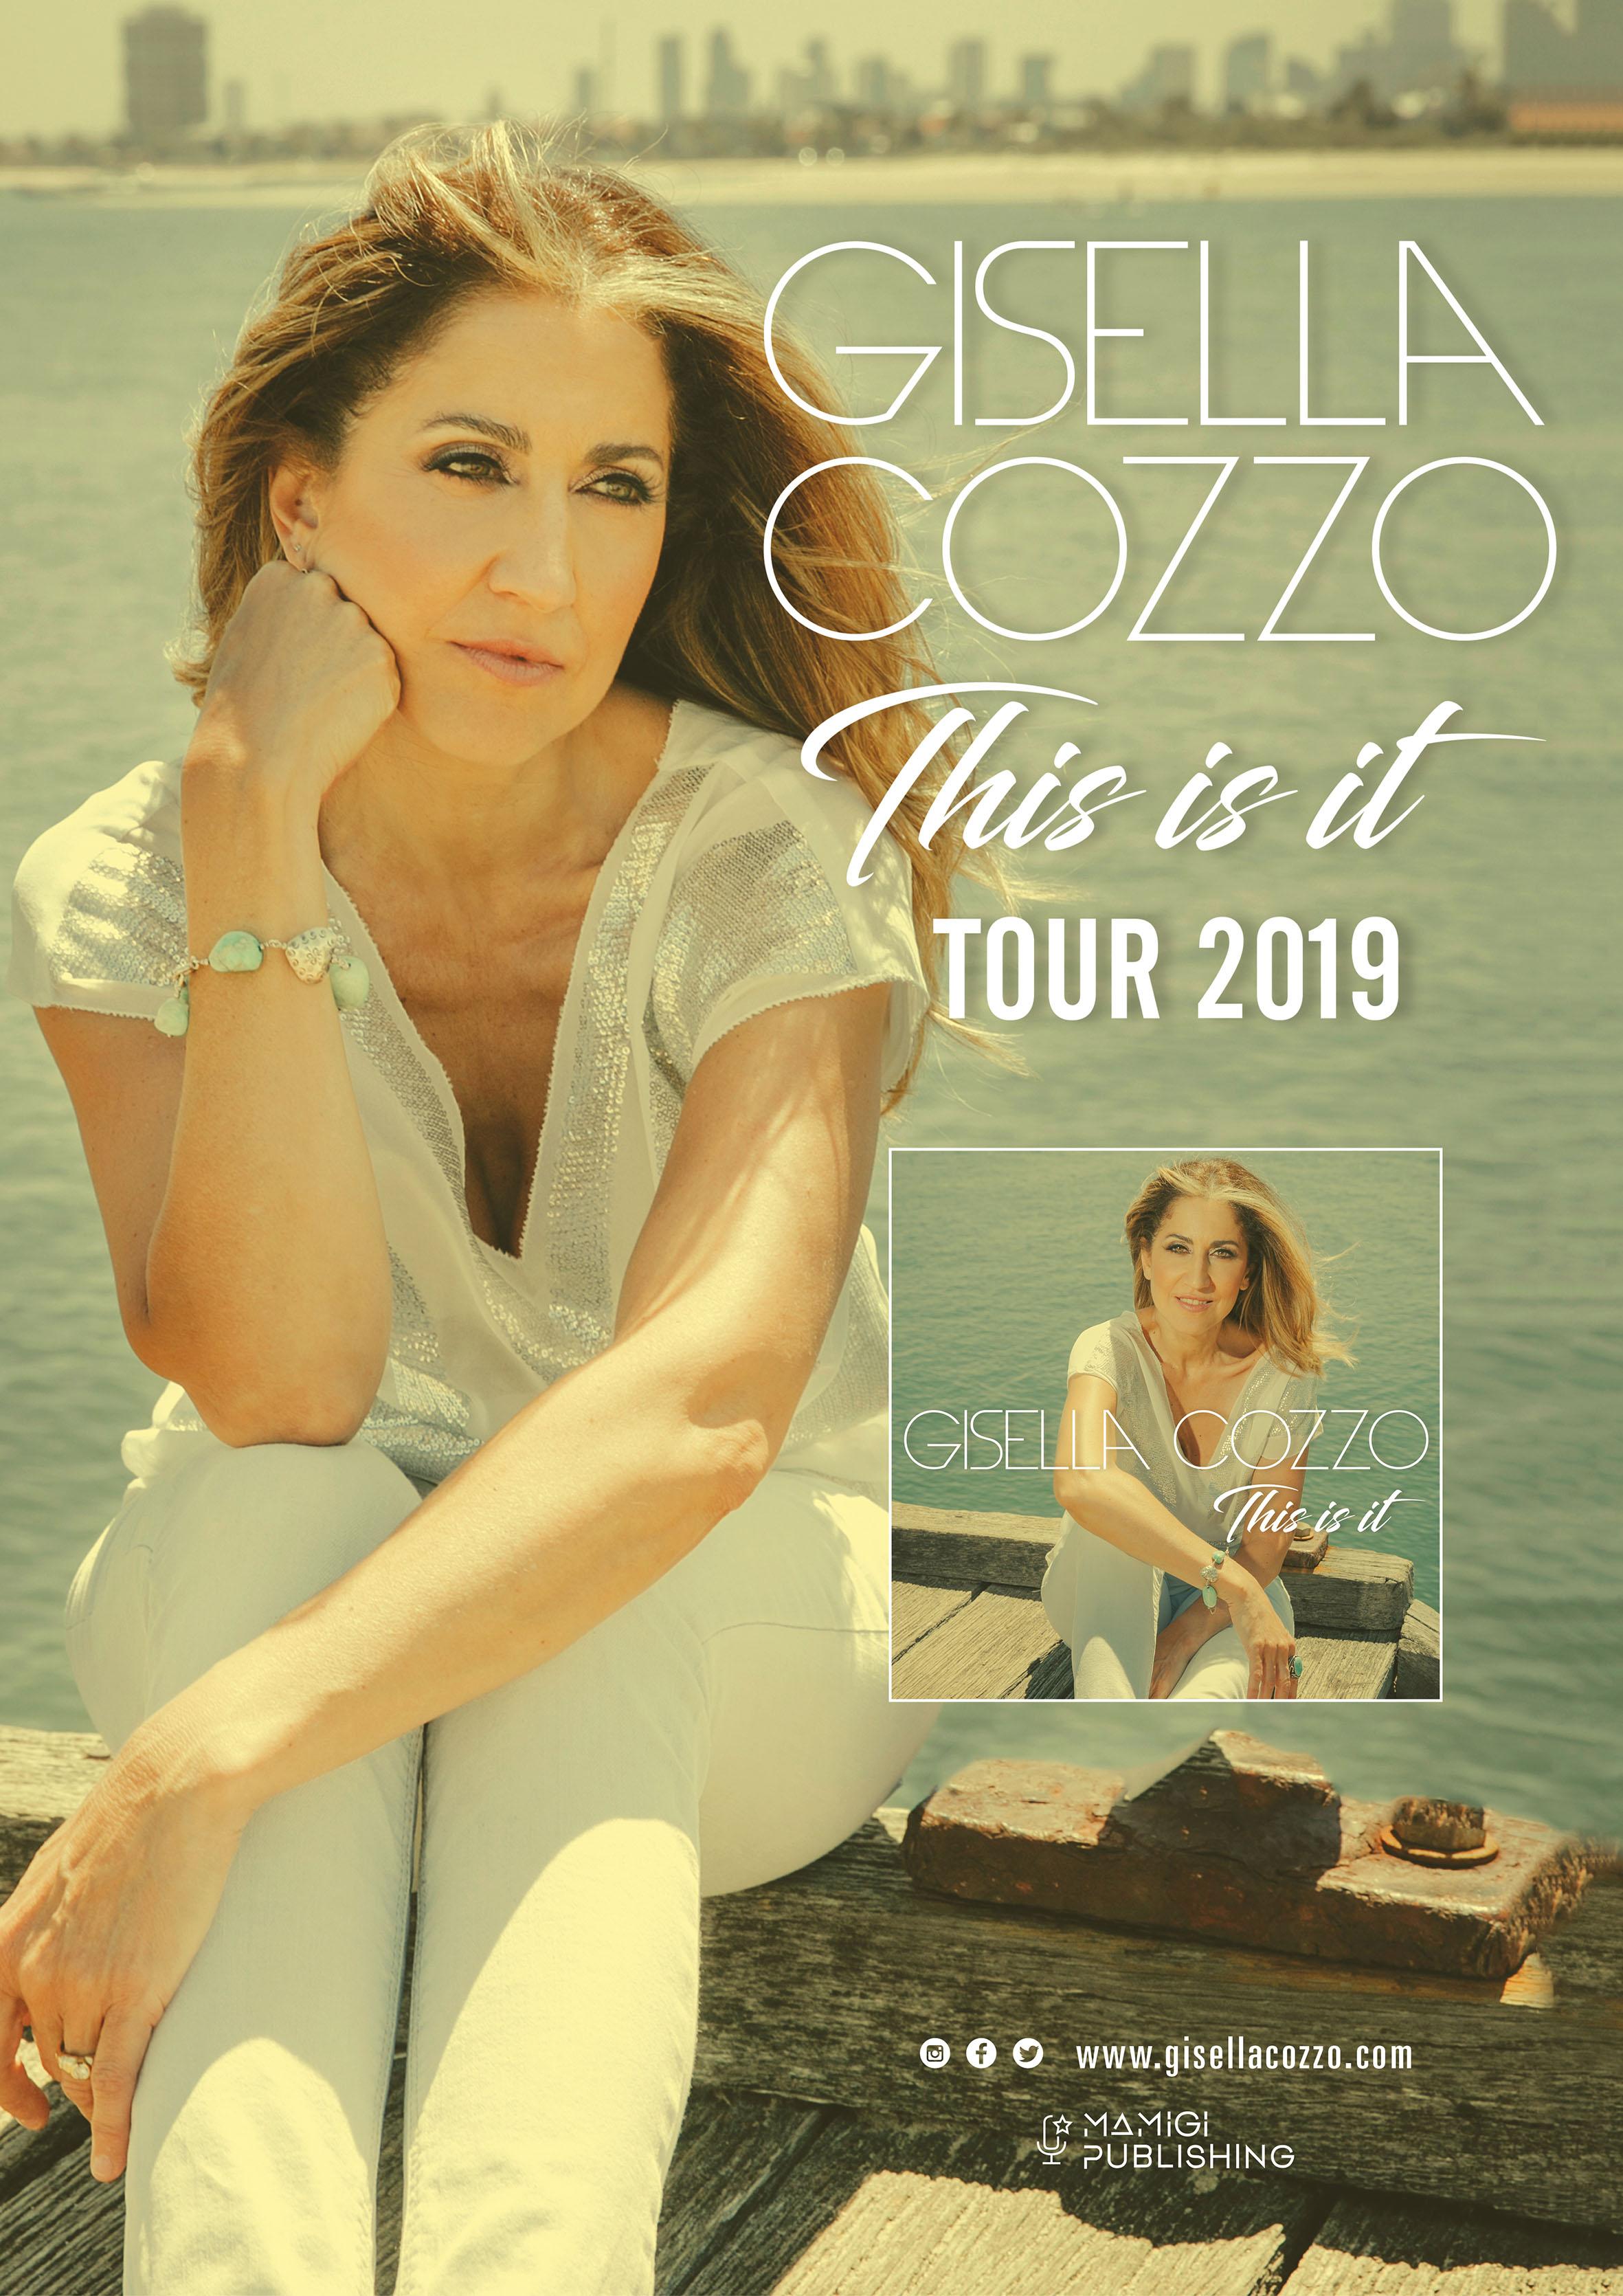 Gisella Cozzo, tour 2019